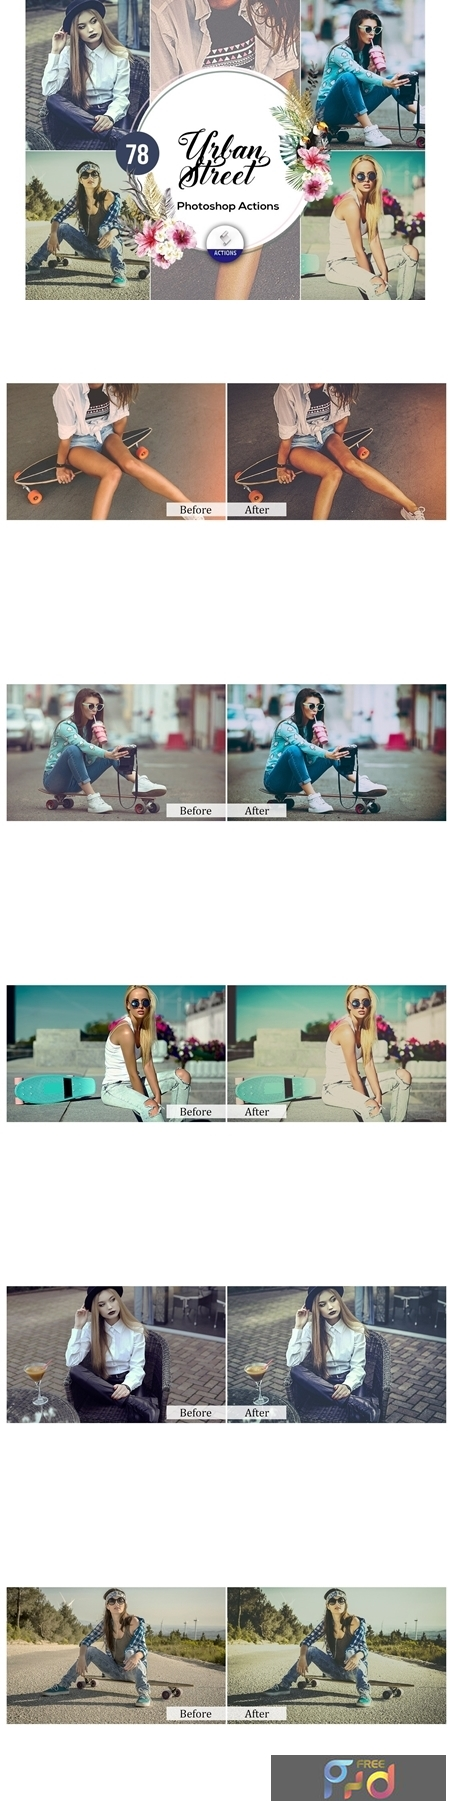 78 Urban Street Photoshop Actions 3938021 1